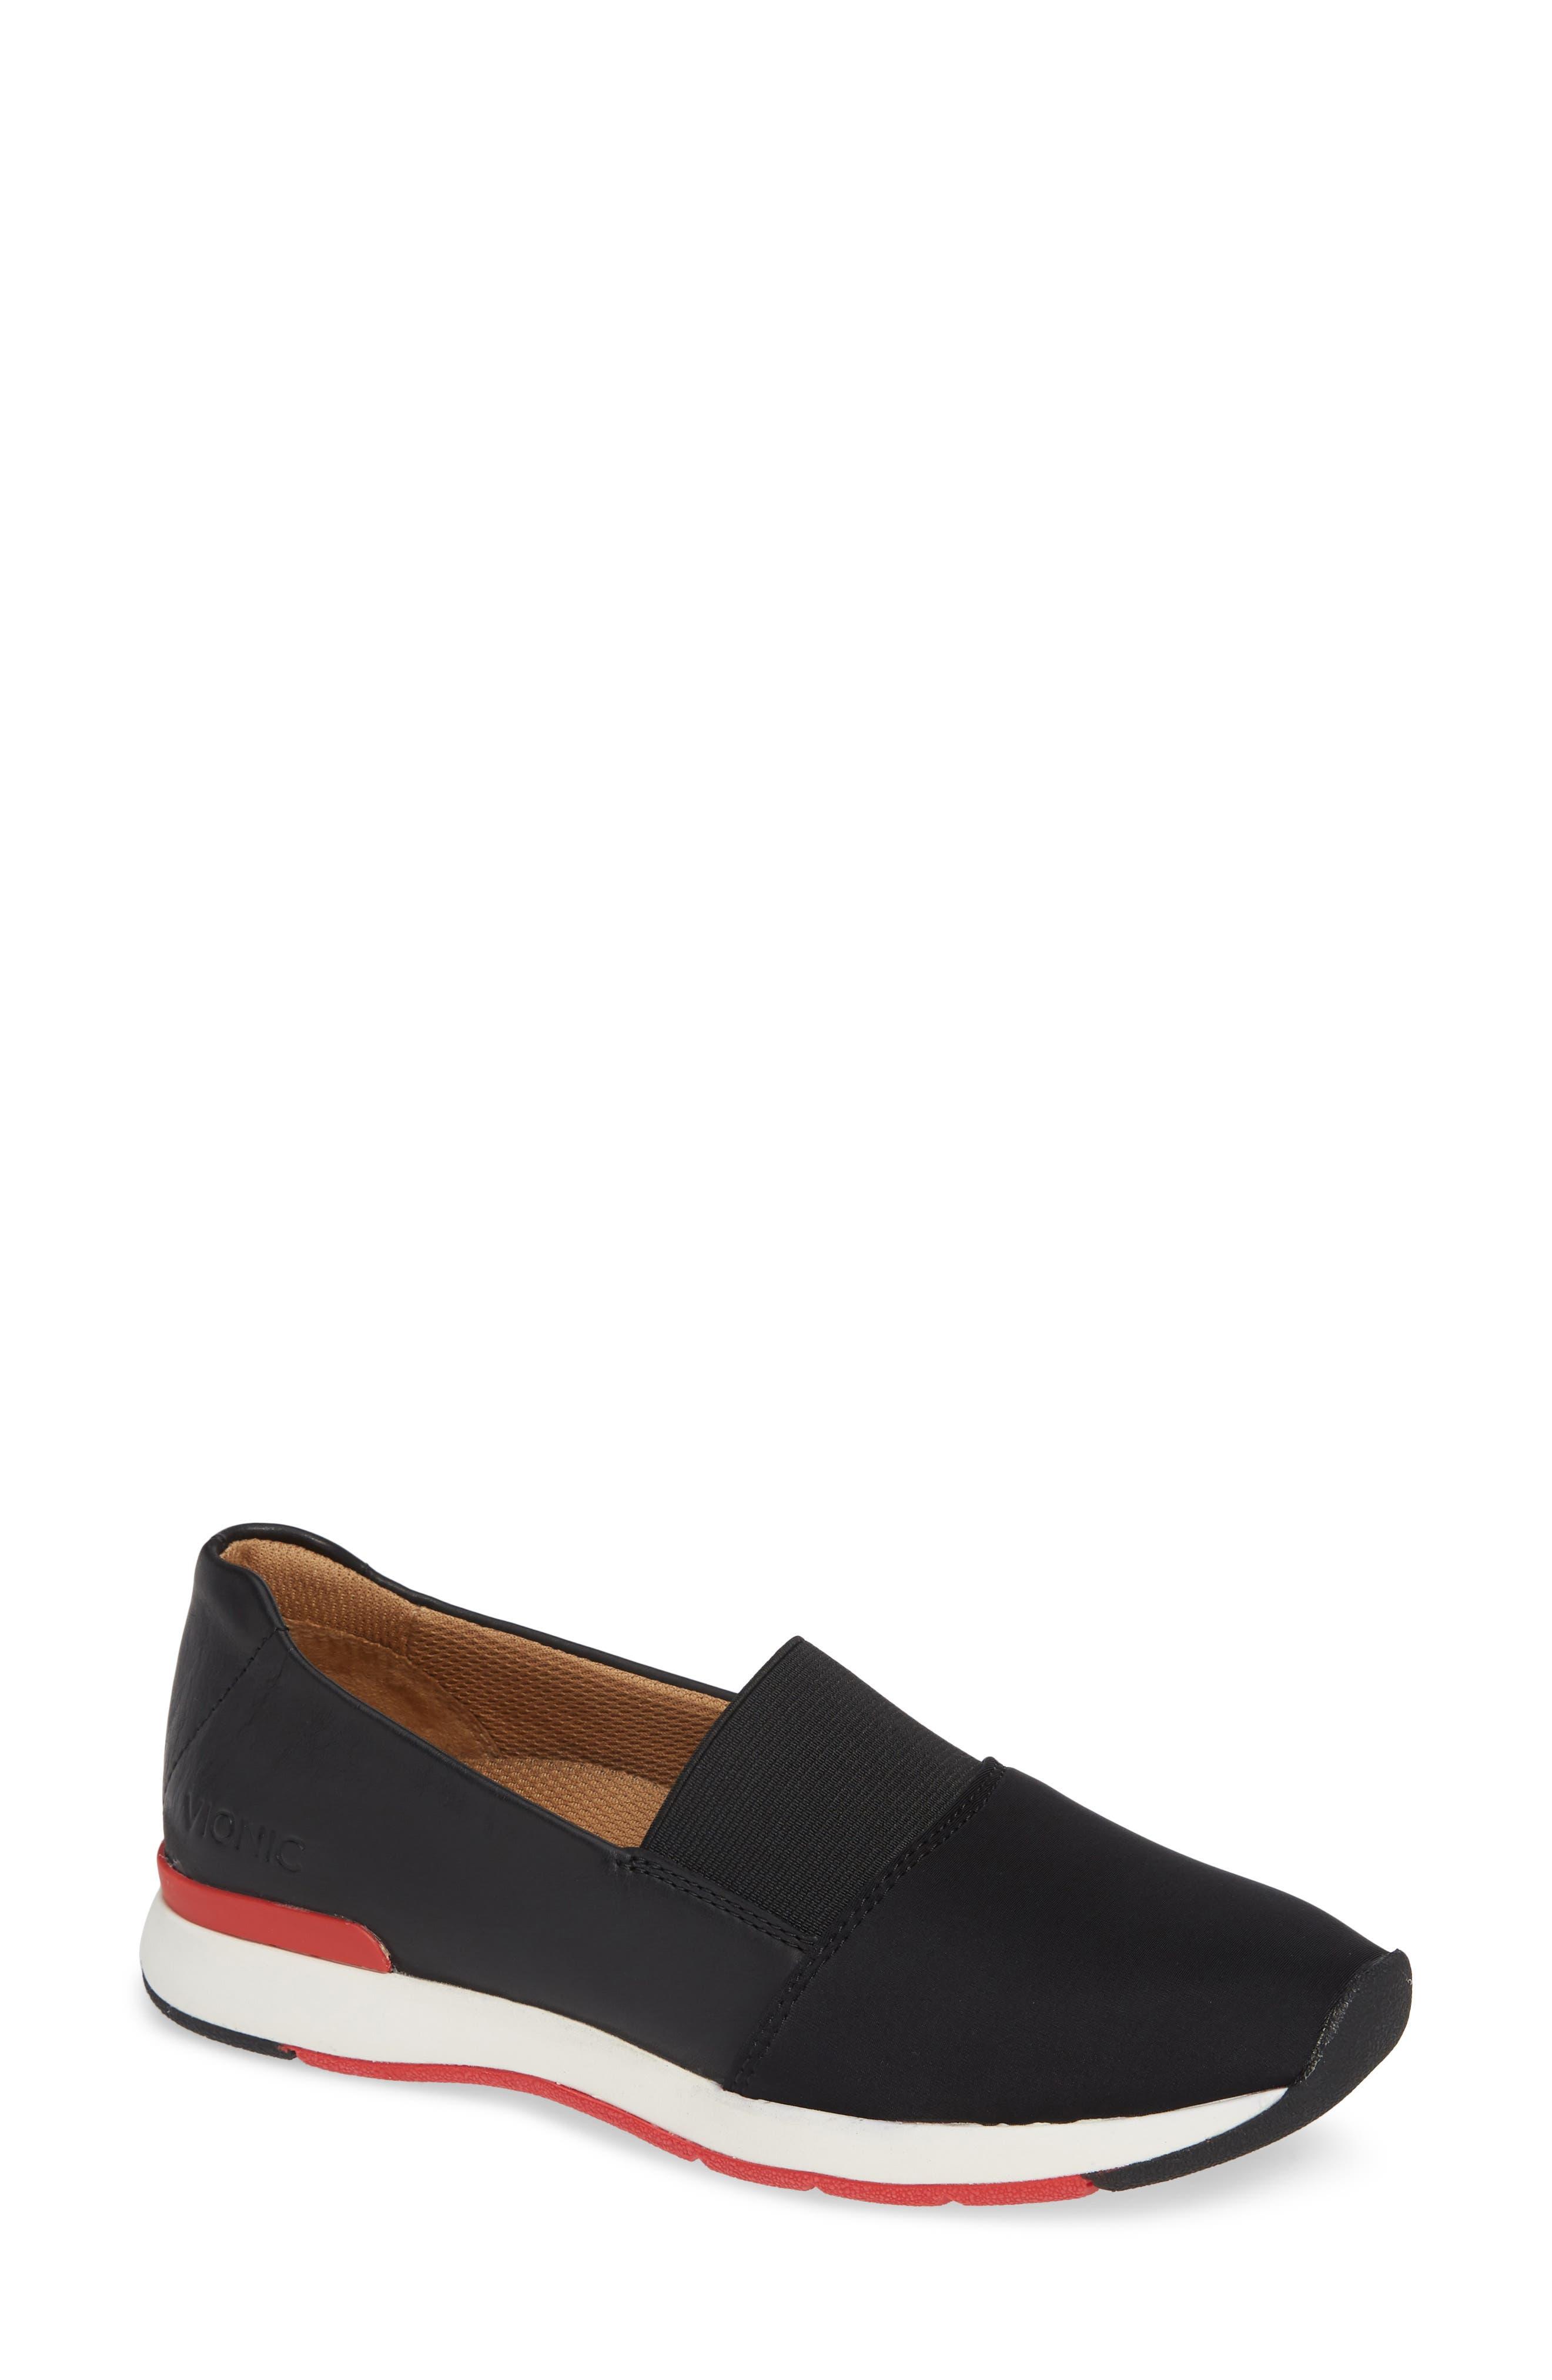 Vionic | Cameo Slip-On Shoe | Nordstrom